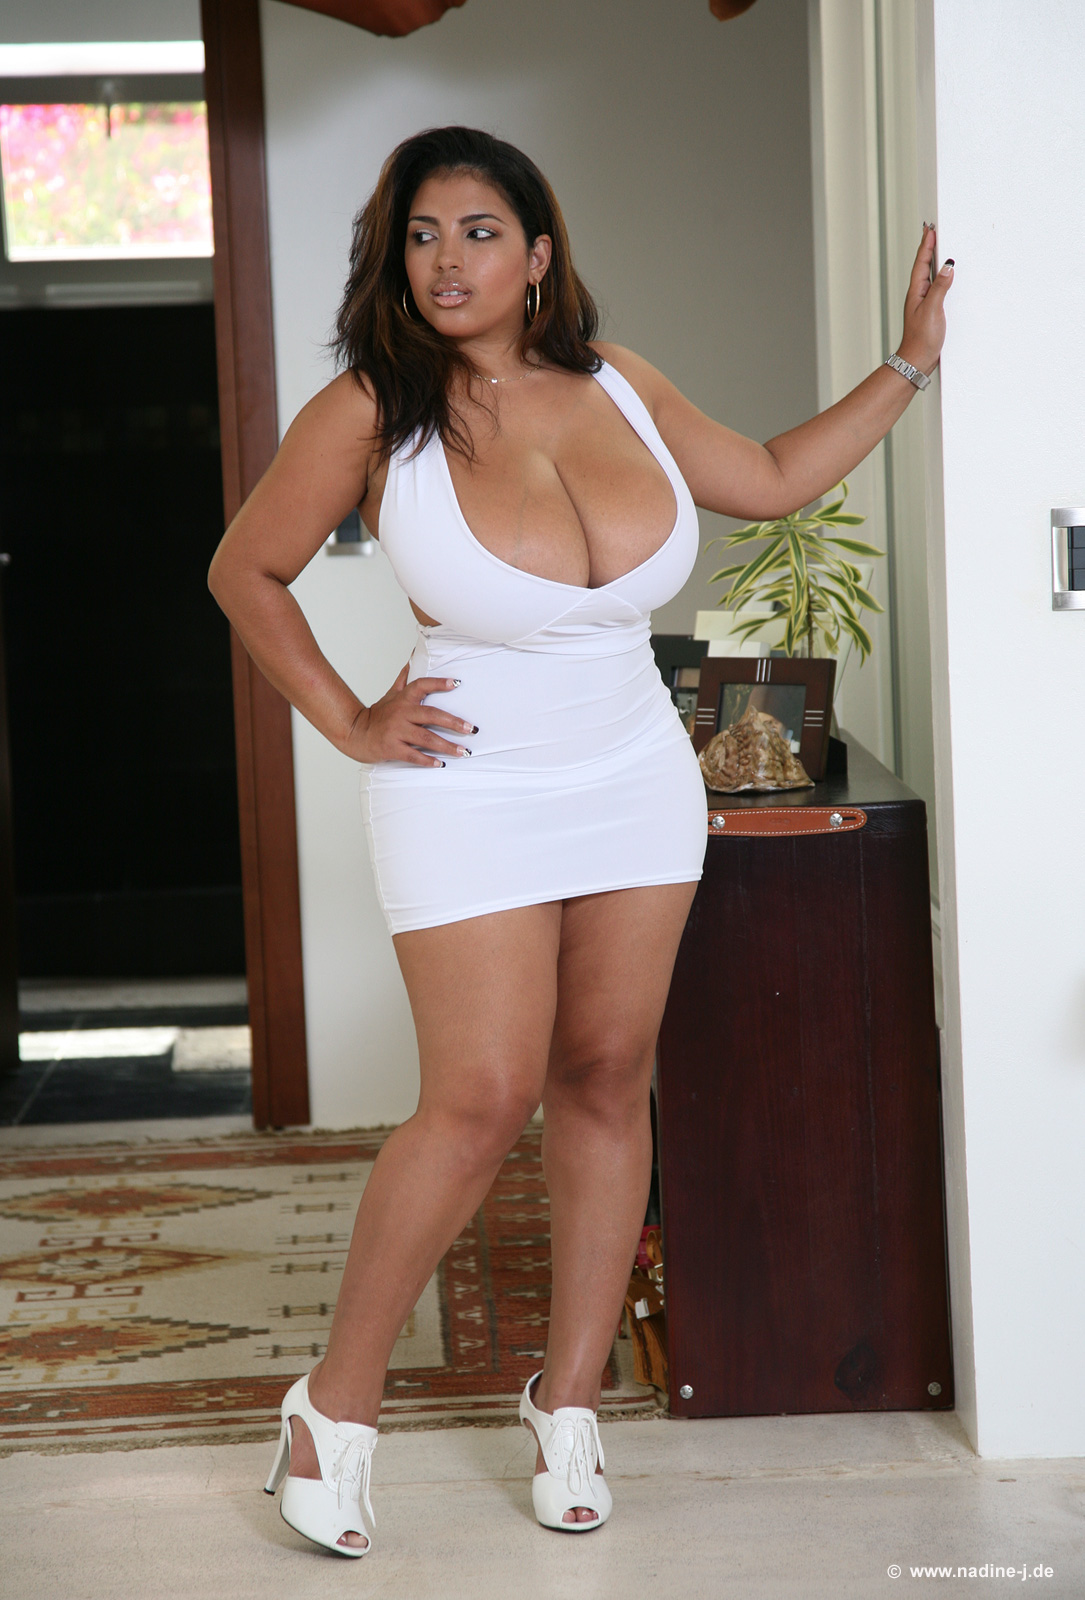 Dominican Girl Tube Search 227 videos - NudeVista